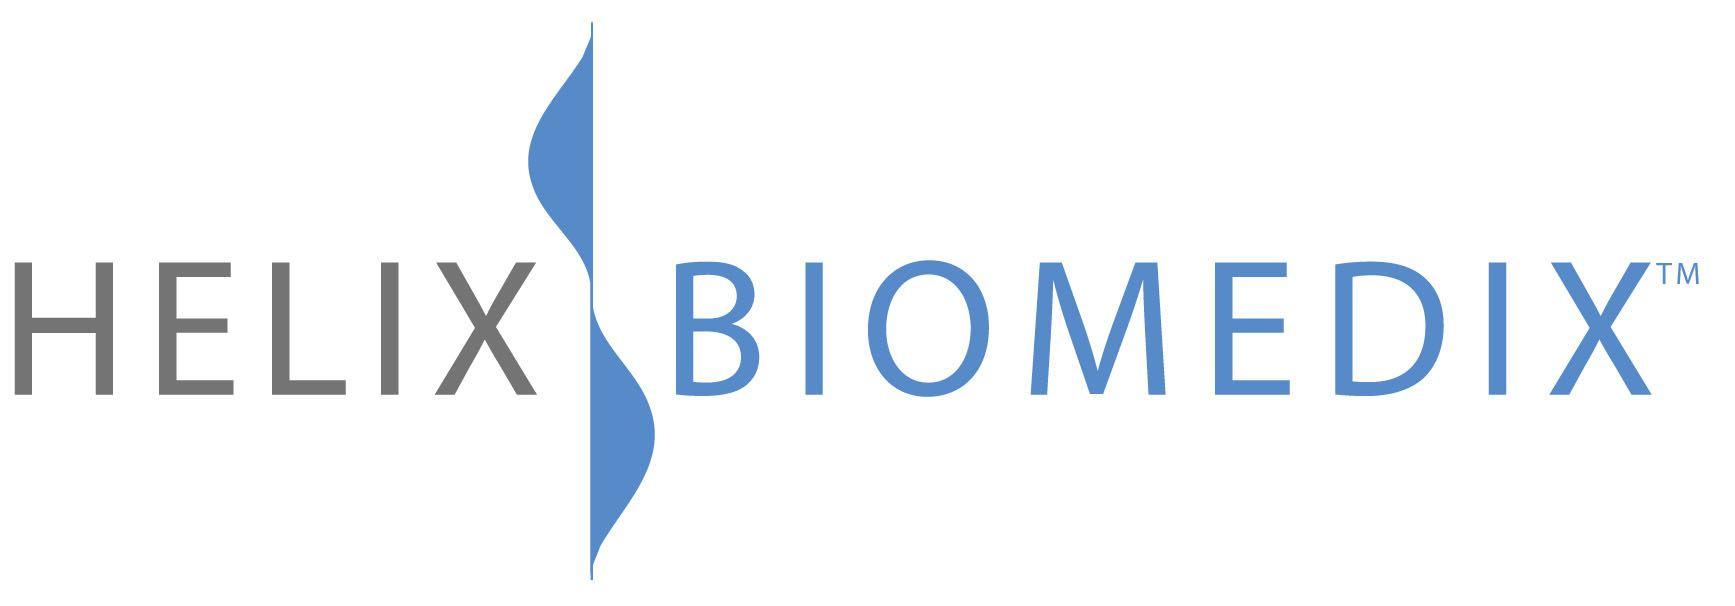 Helix BioMedix, Inc Logo